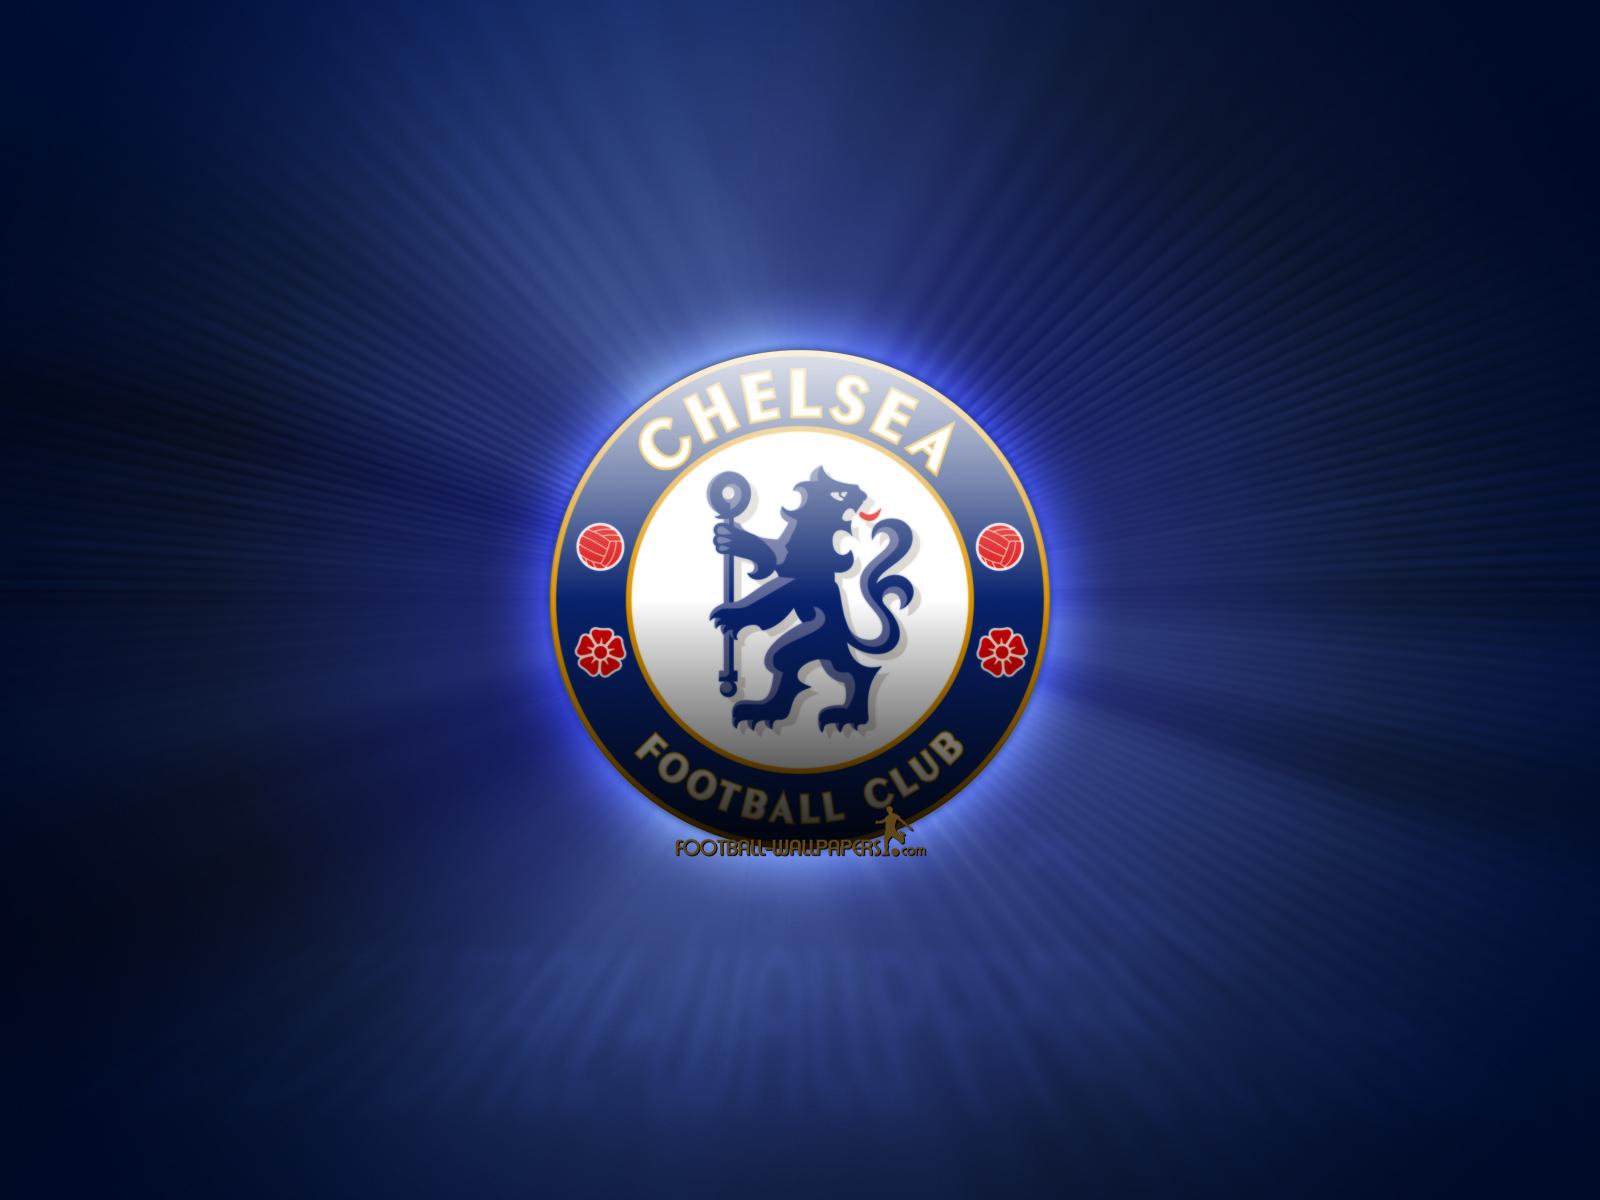 1001 WALLPAPER Logo Chelsea F C Chelsea Football Club